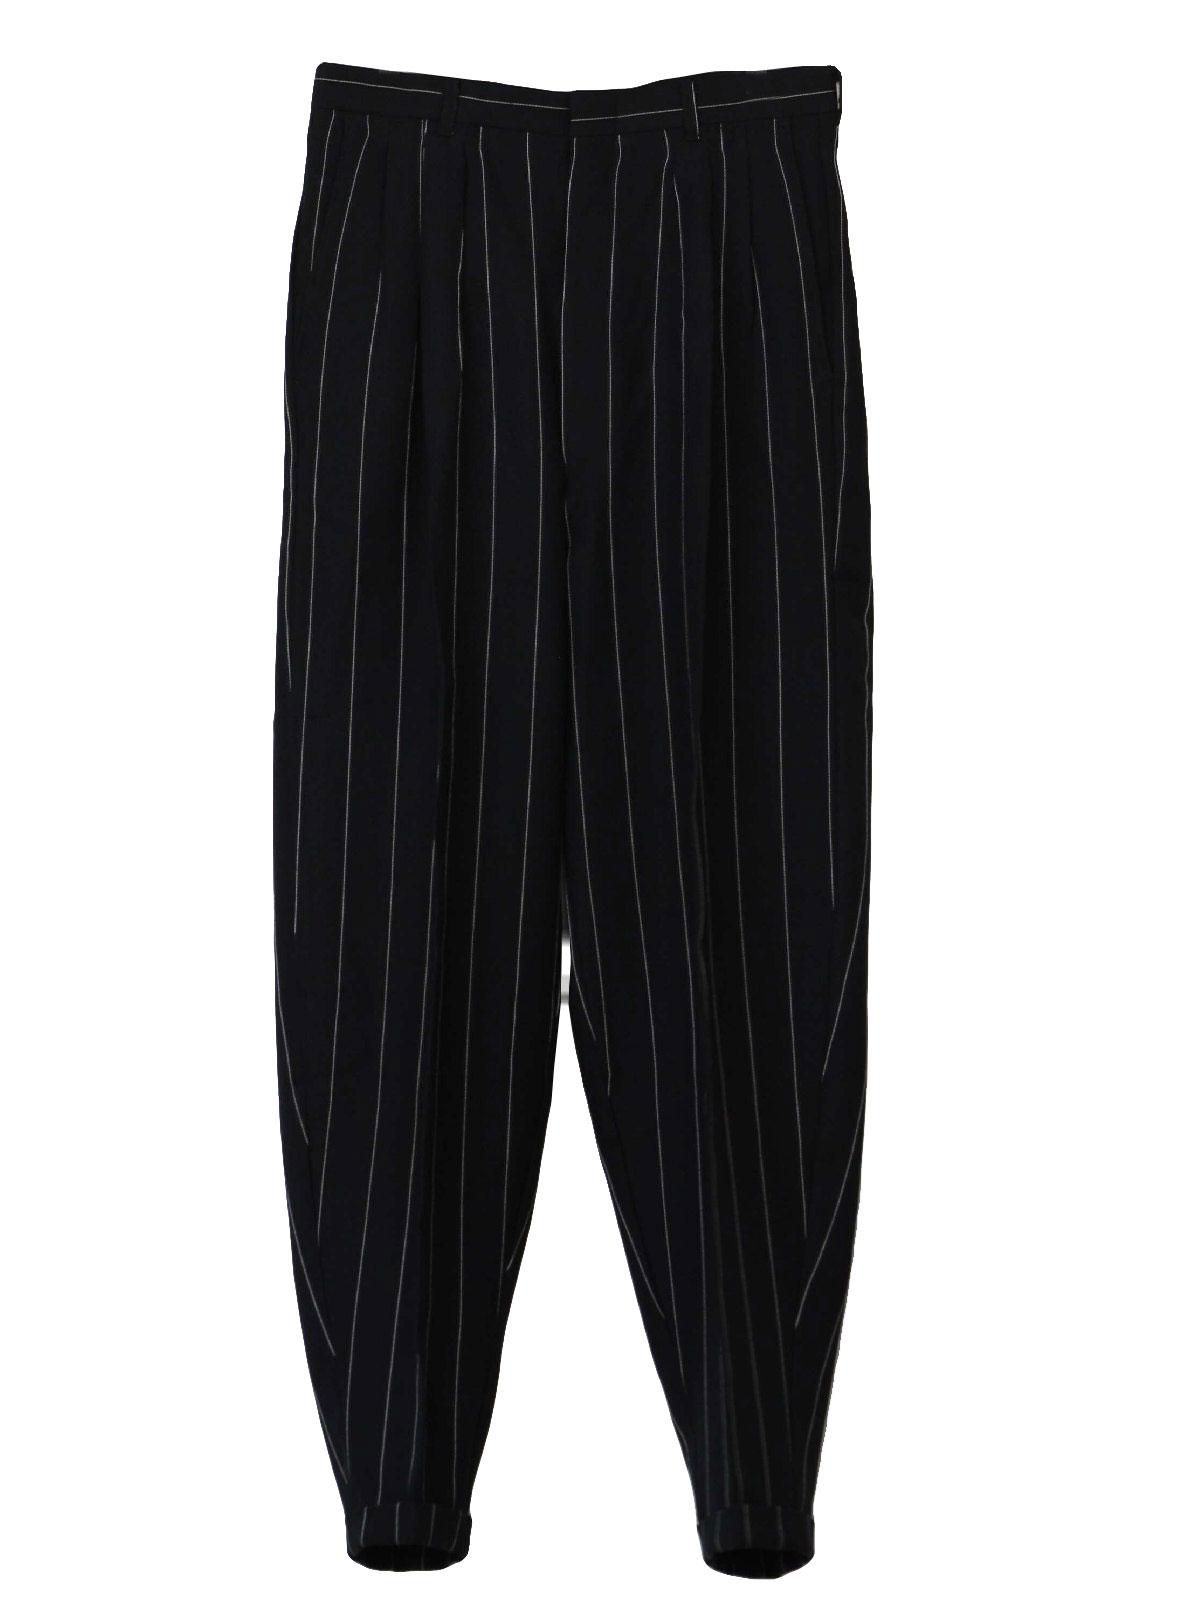 Retro 1940s Pants Smokey Joes  40s style made